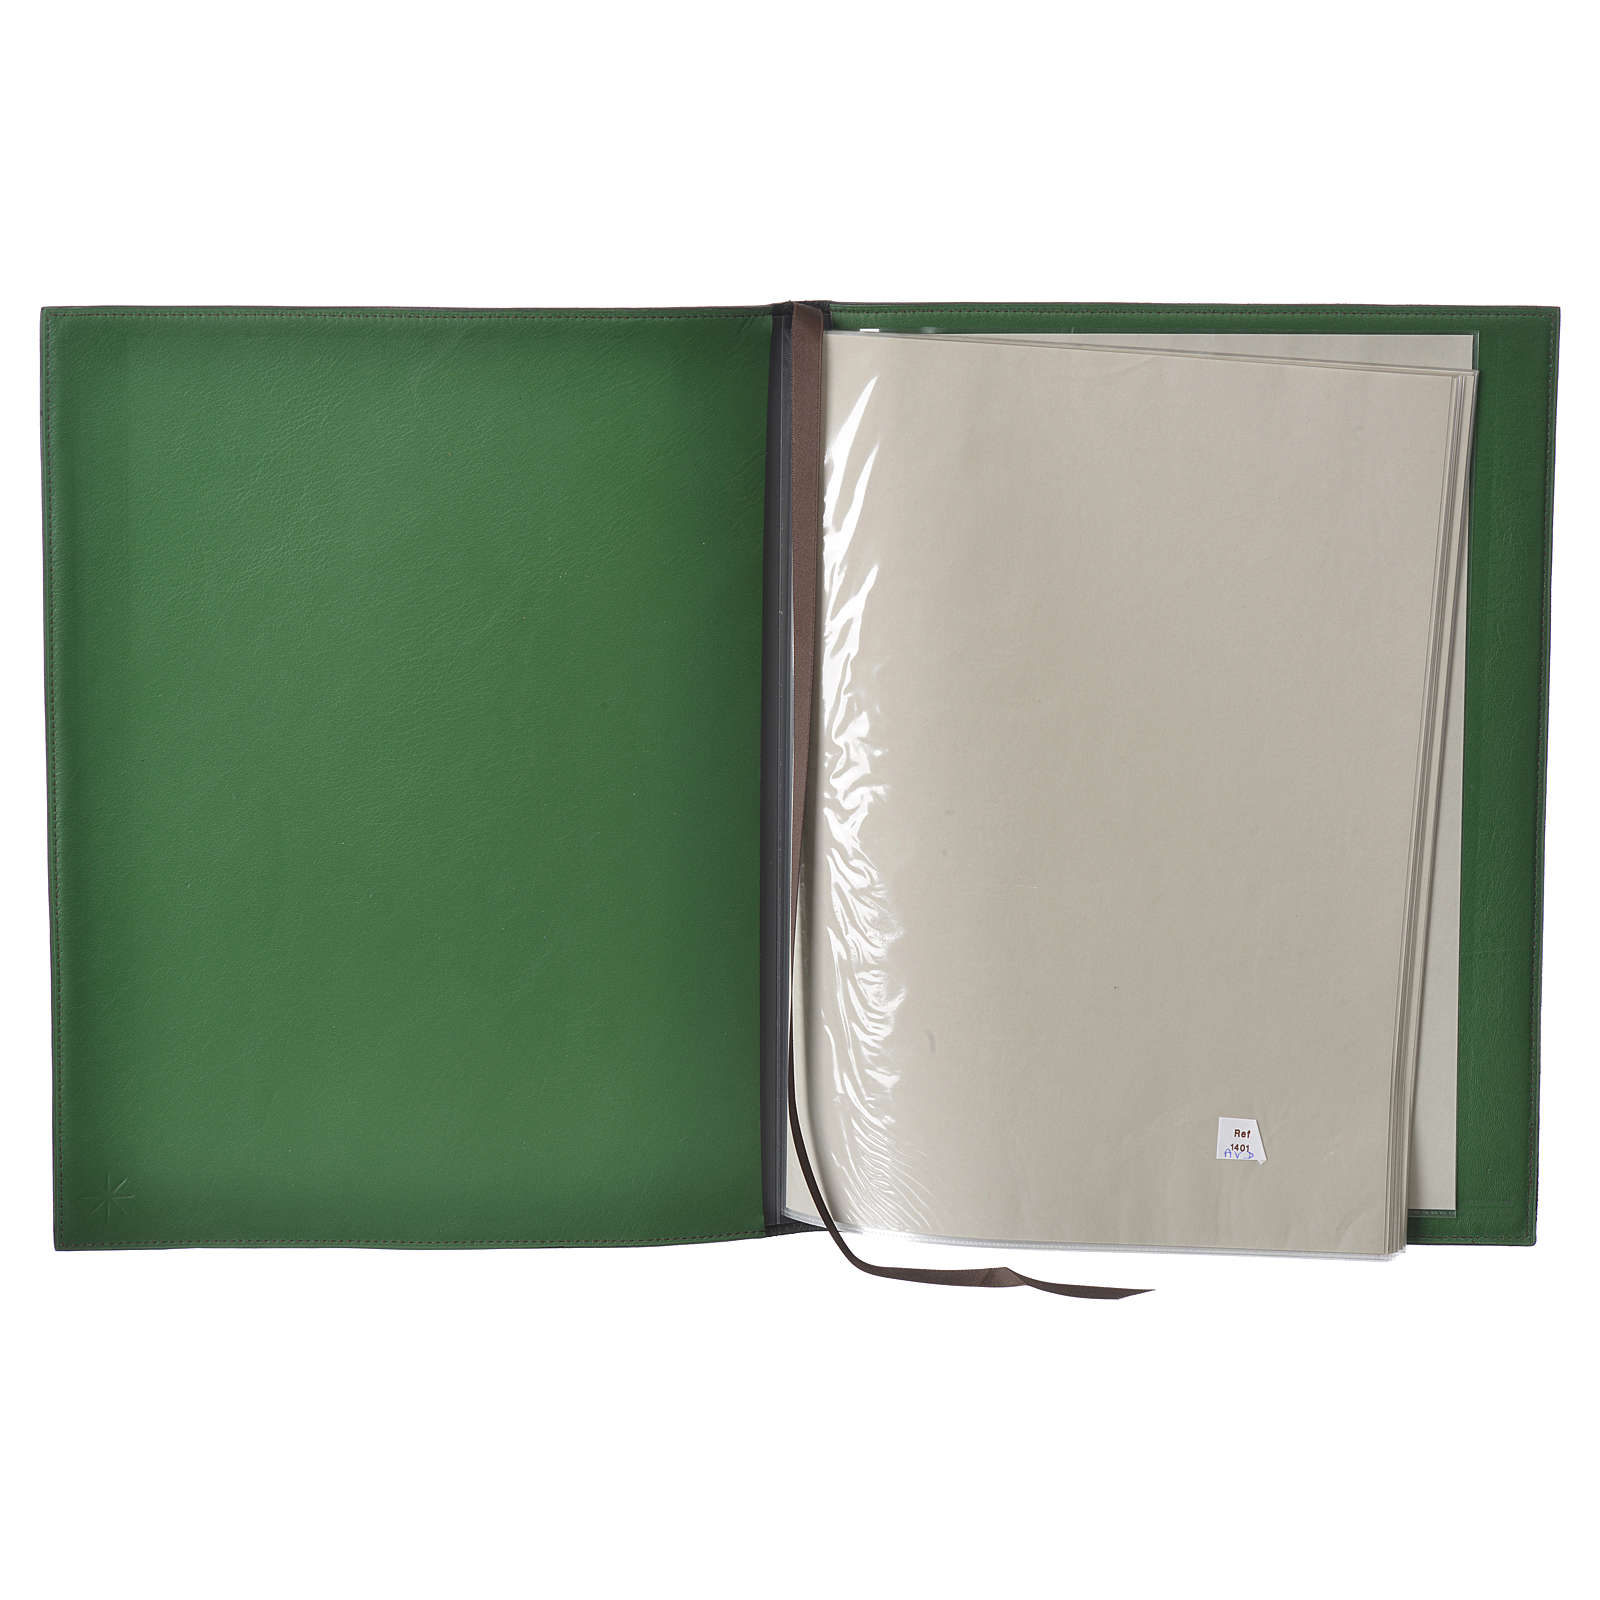 Folder for sacred rites in green leather, hot pressed golden lamb Bethleem, A4 size 4